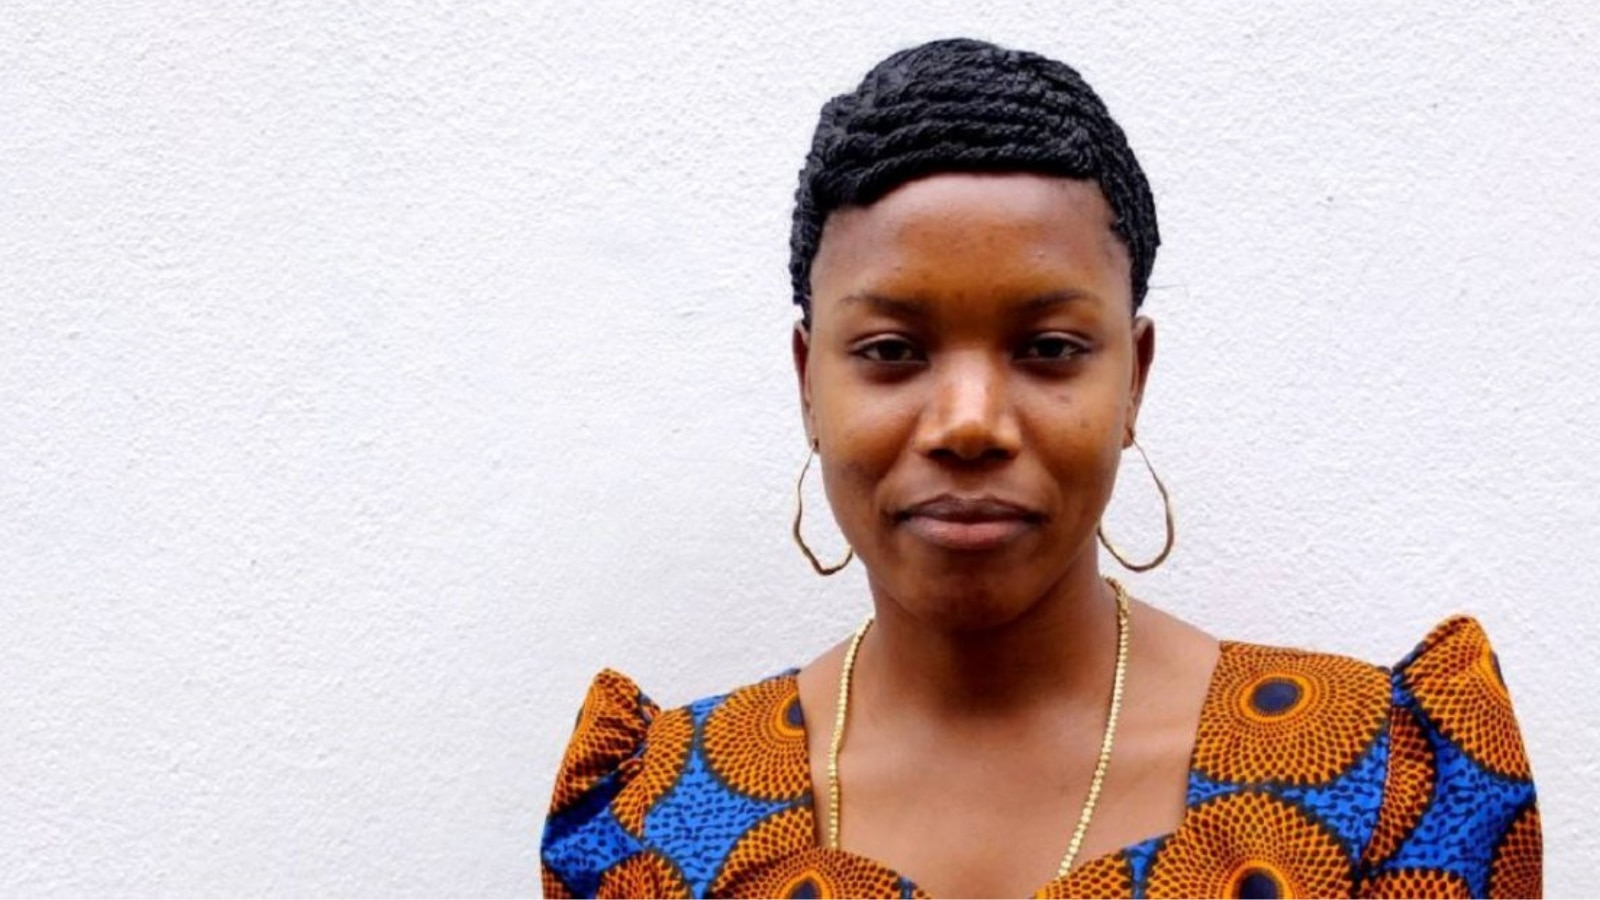 Pictured here is Tanzanian civil society activist Angela Benedicto. (Photo courtesy of Angela Benedicto)